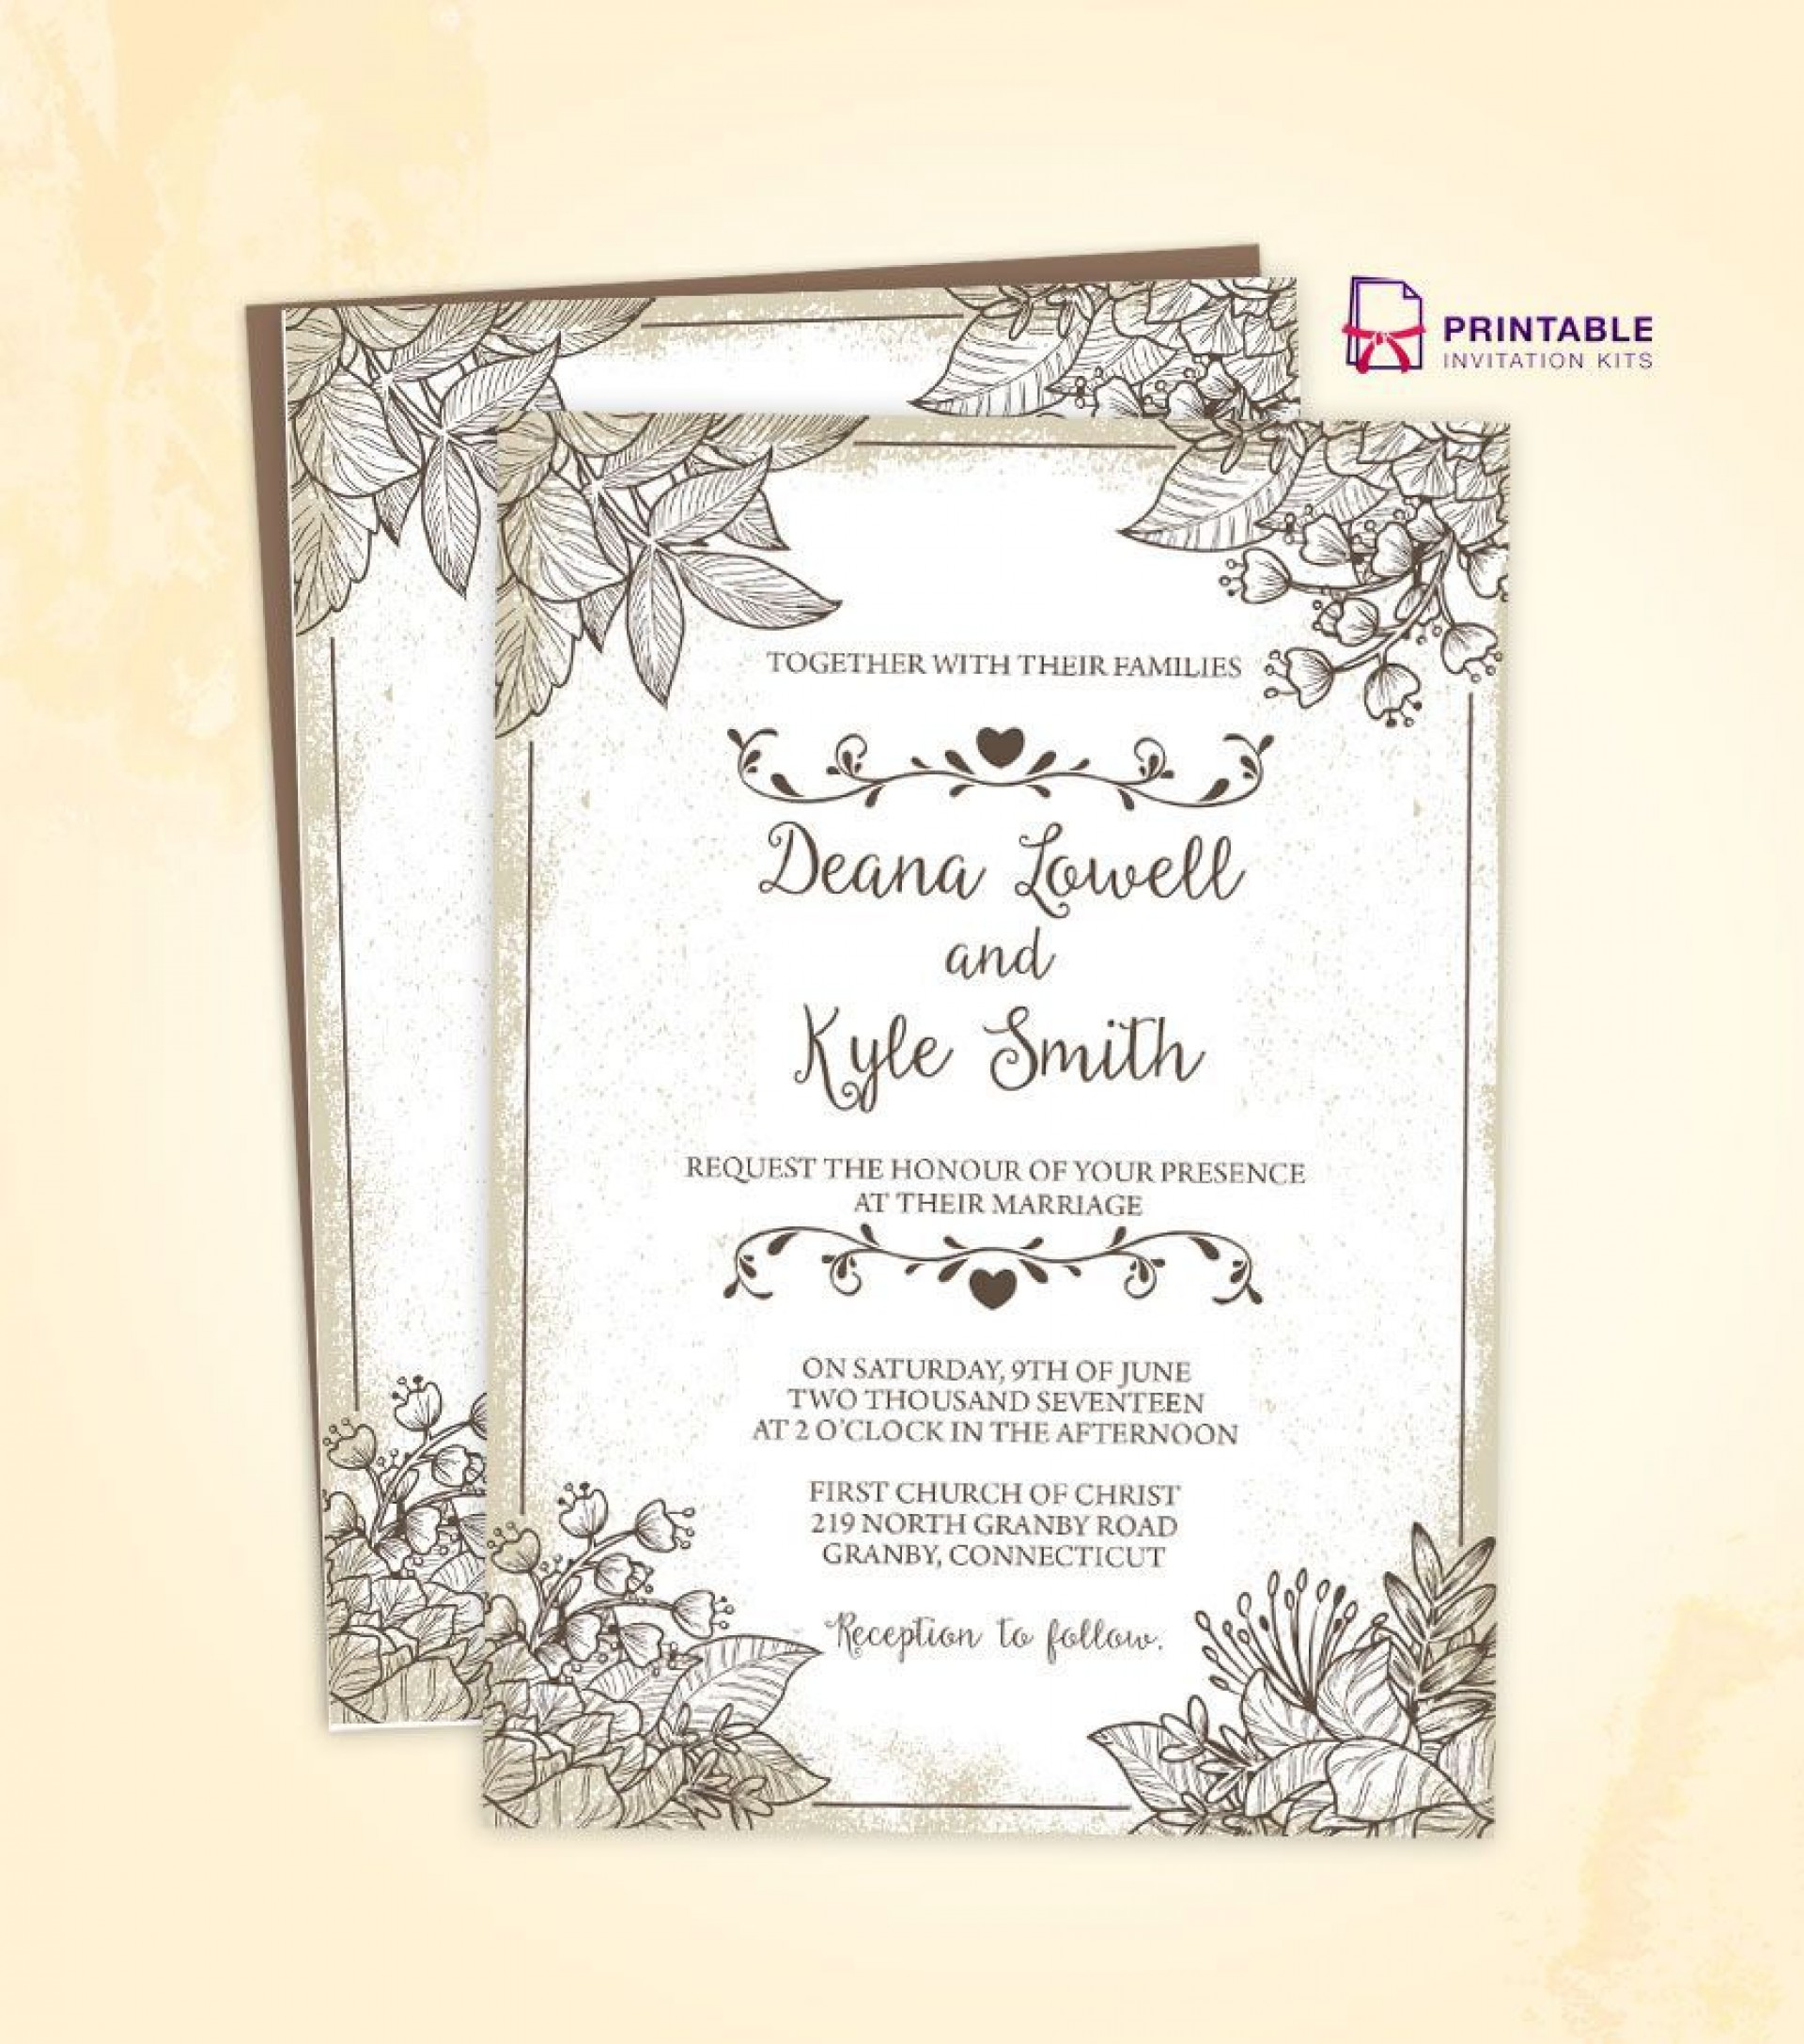 002 Marvelou Sample Wedding Invitation Template Free Download Highest Quality  Wording1920